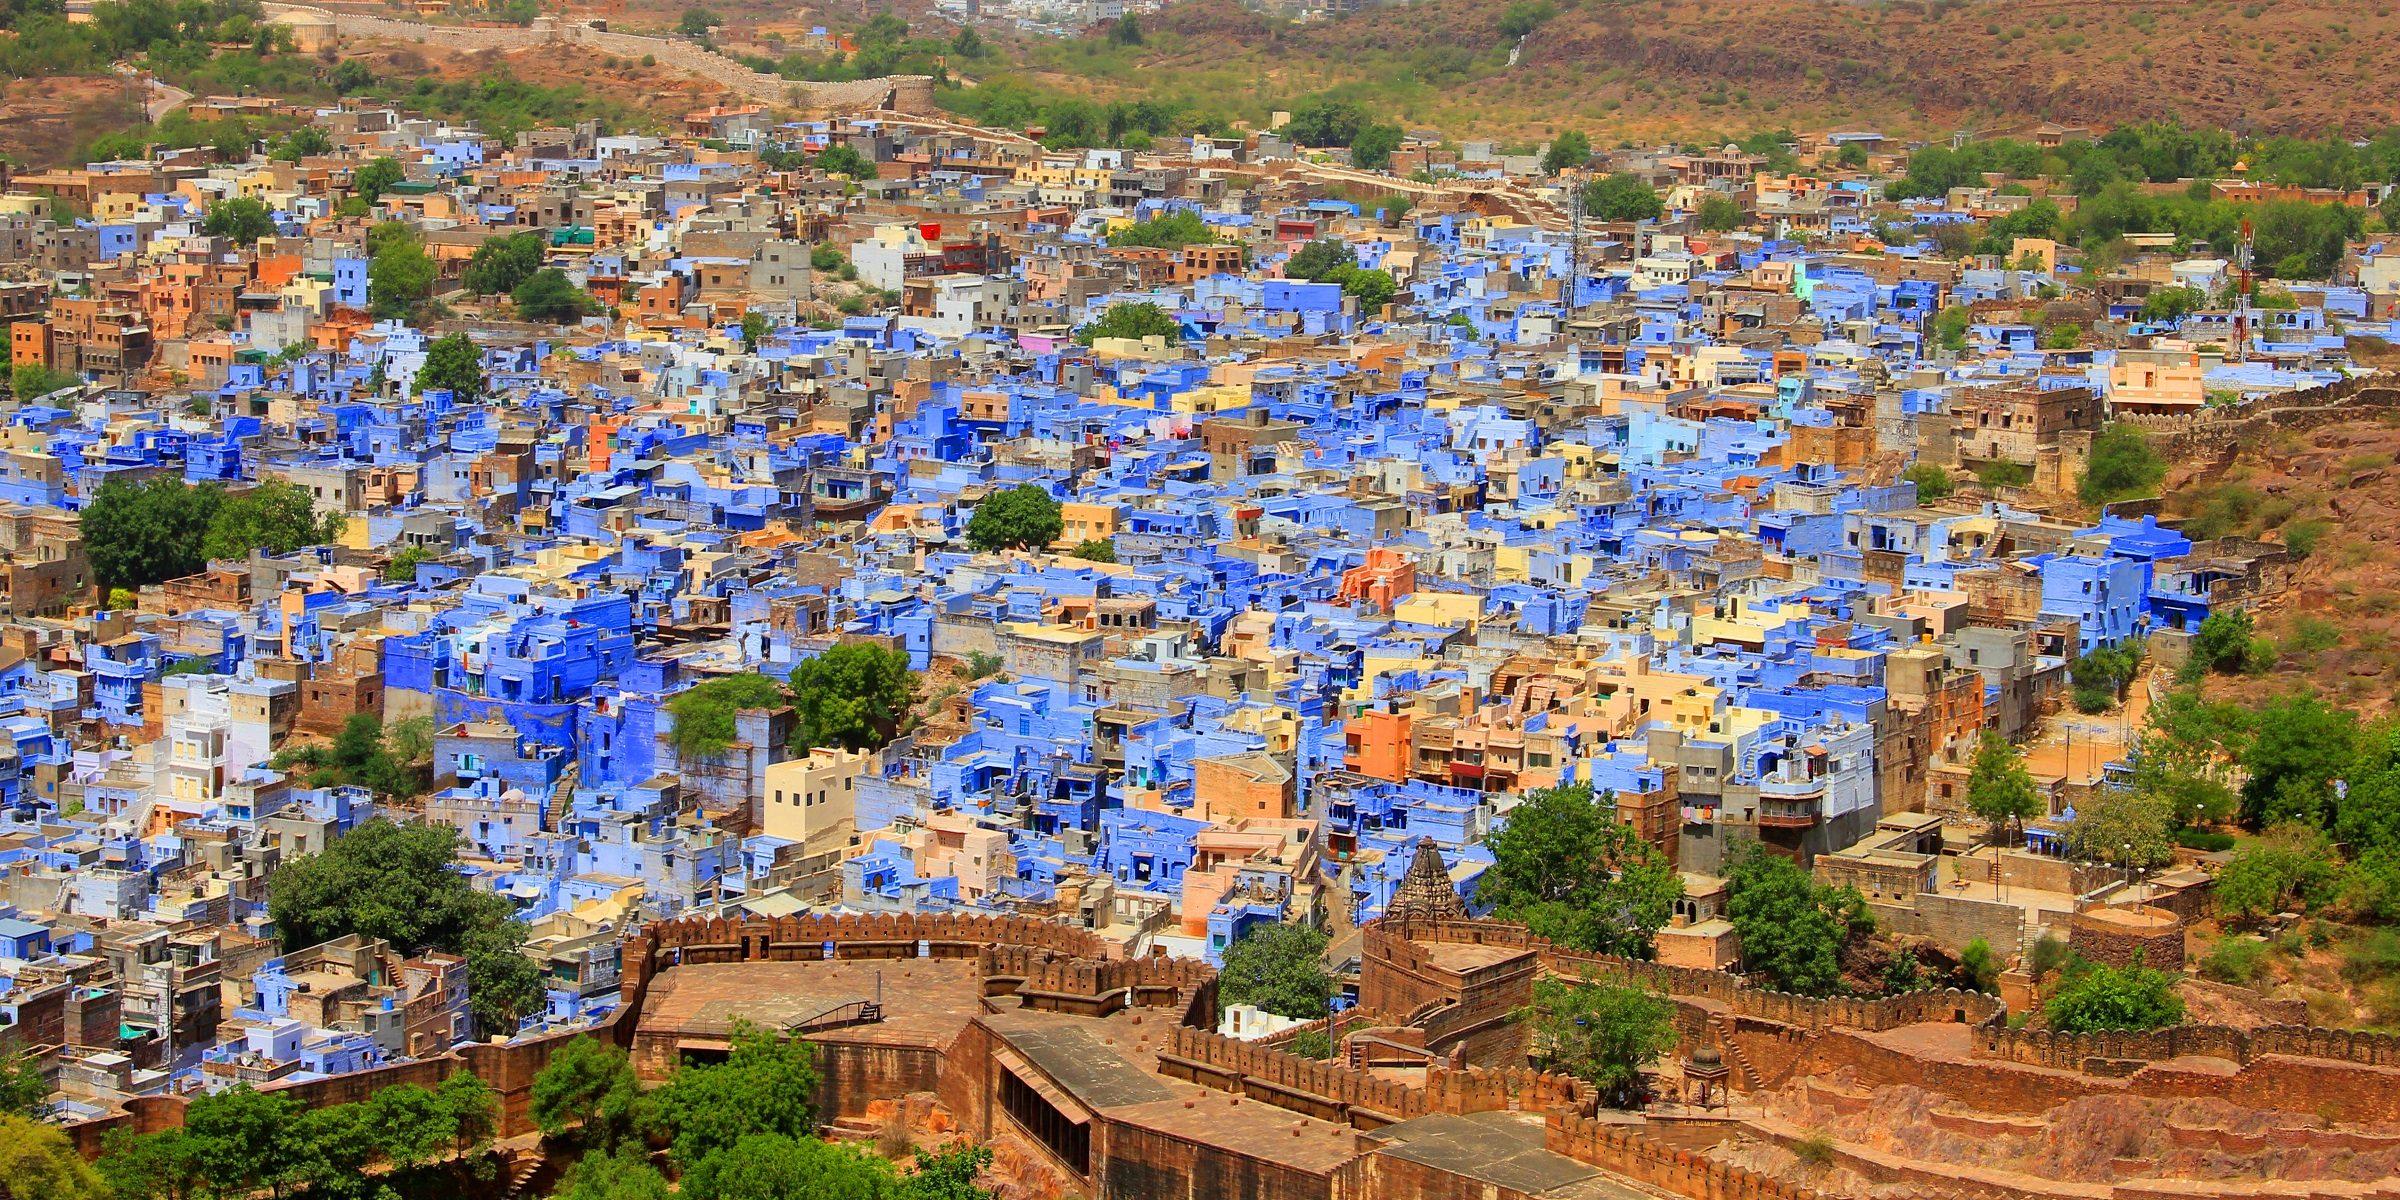 Das blaue Dorf Jodhpur in Indien